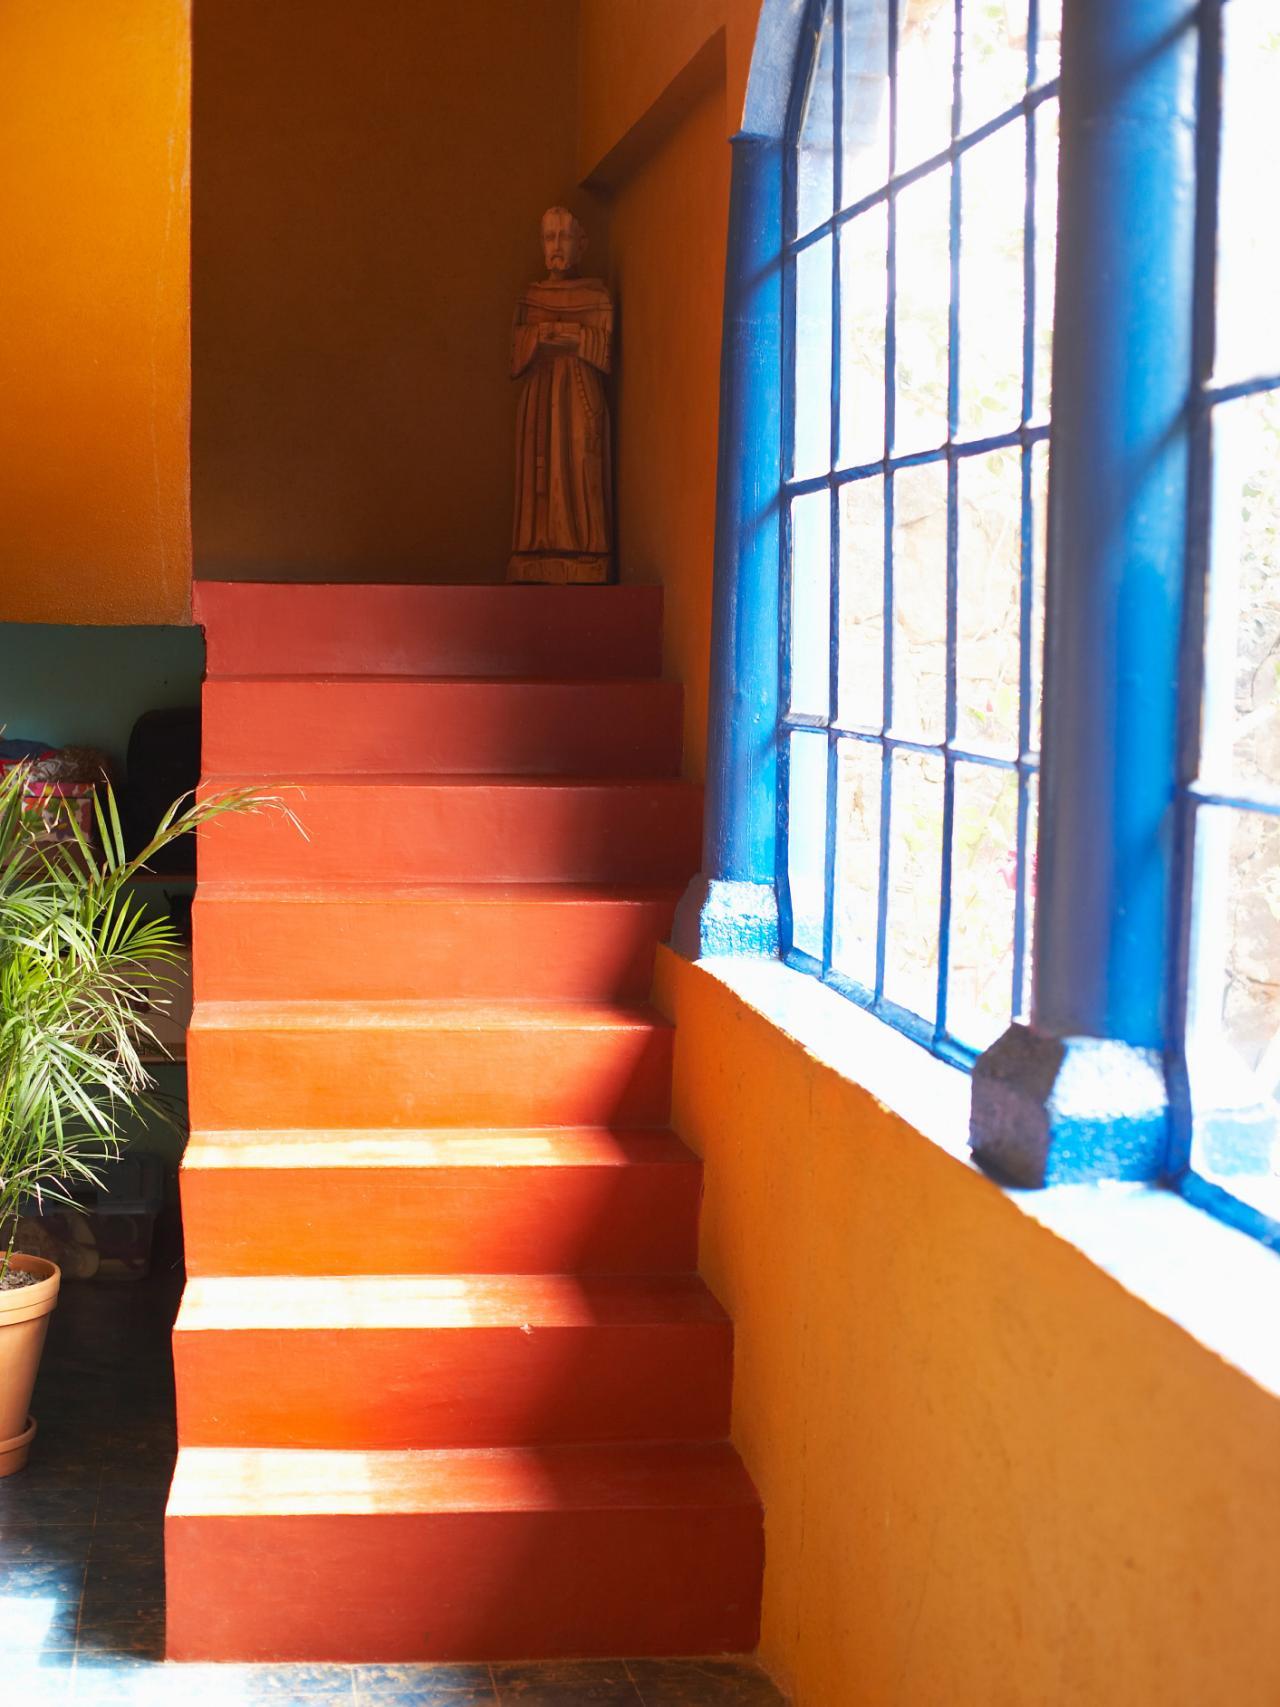 Tremendous Paint Color And Decorating Tips Hgtv Largest Home Design Picture Inspirations Pitcheantrous